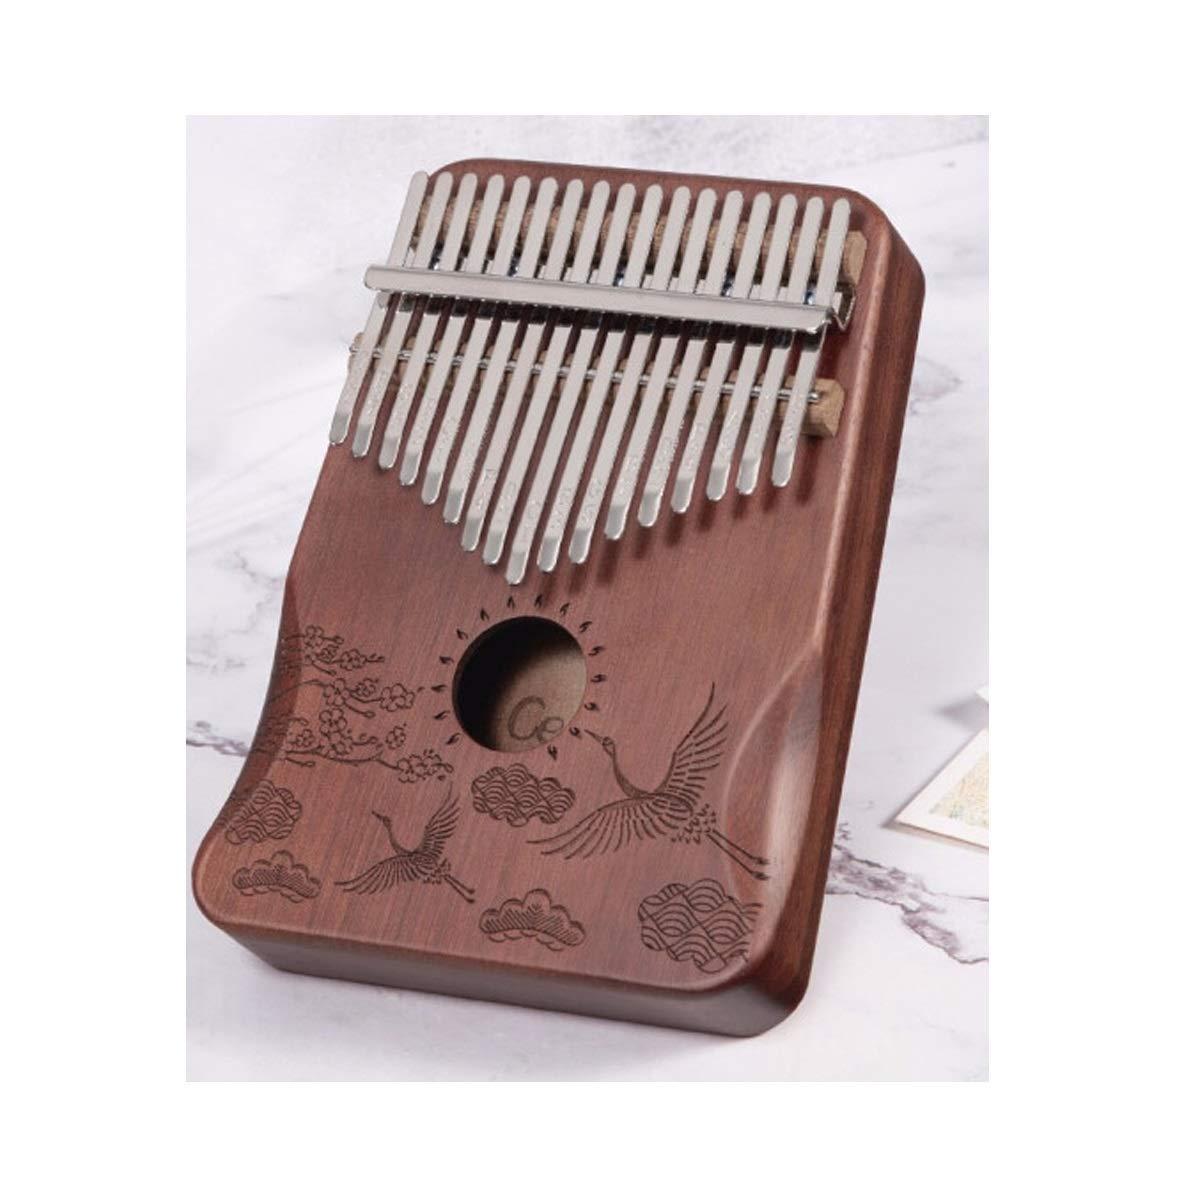 HENGTONGWANDA Kalimbaqin Thumb Piano 17 Sound Beginner Kalimba Piano Portable Entry Finger Piano Acacia Wood Crane, Suitable For Beginners, Advanced Performers, Best Gift (Color : C) by HENGTONGWANDA